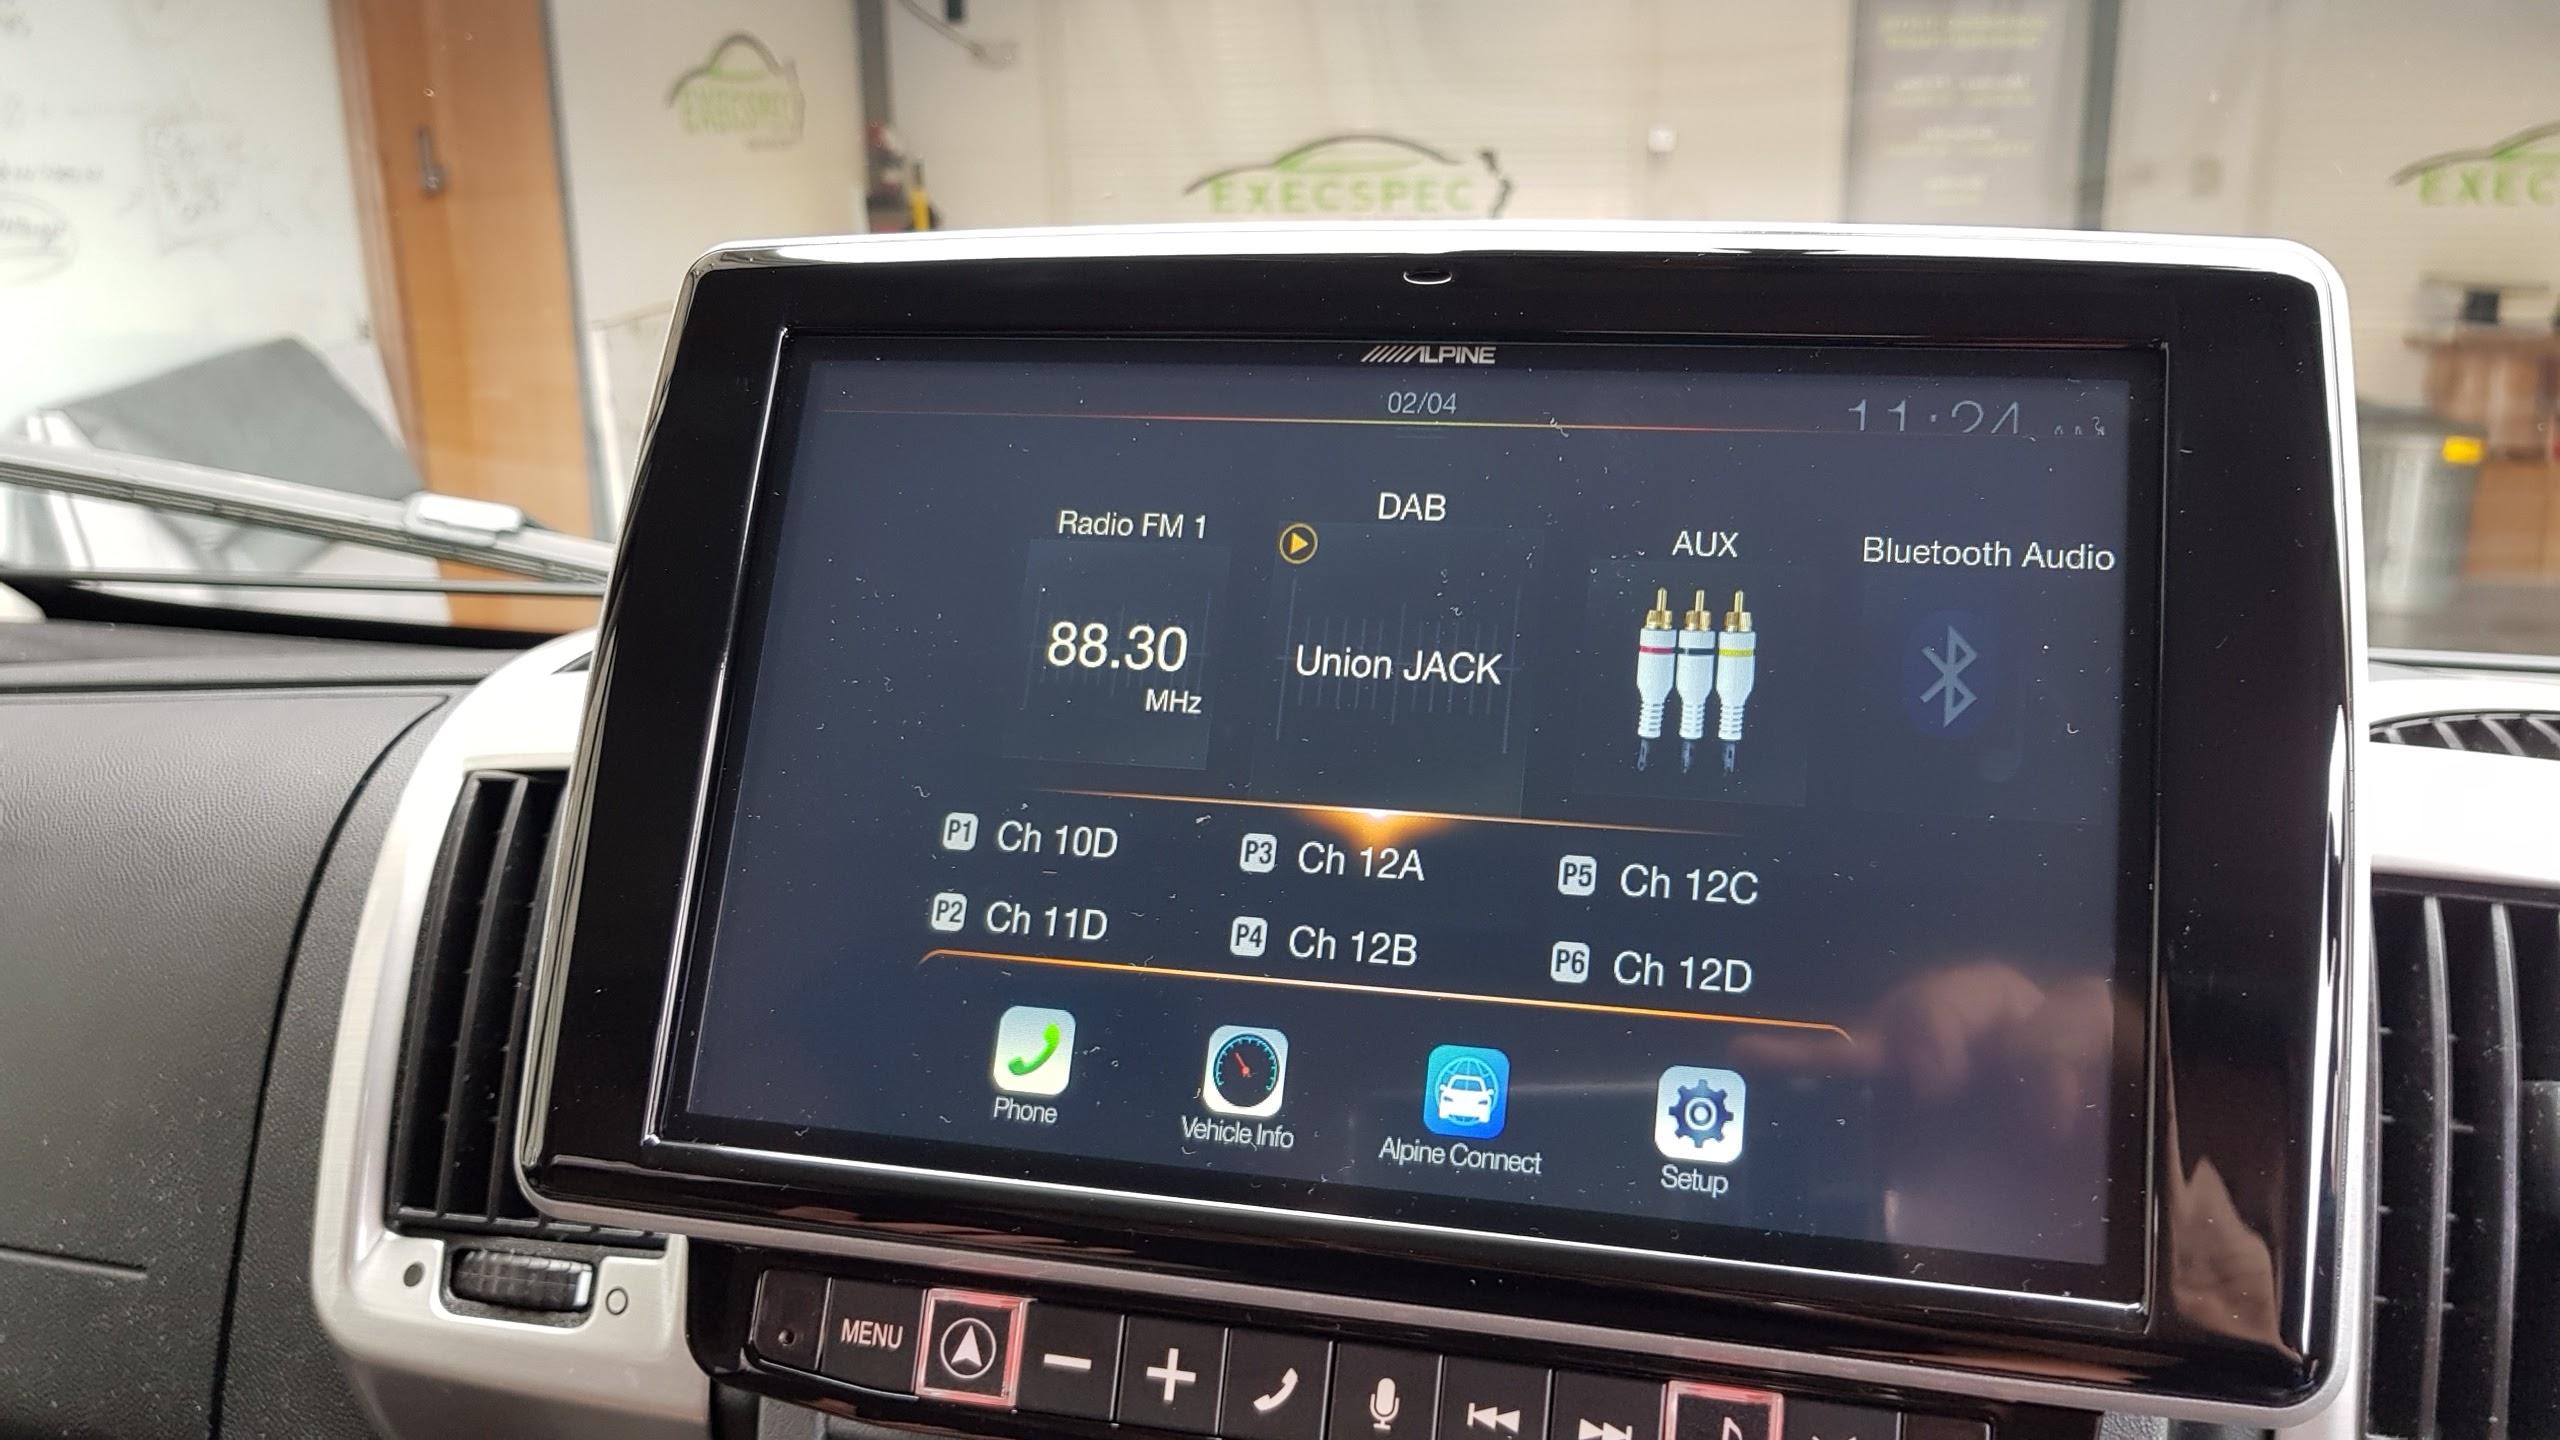 Tremendous Peugeot Boxer Fuse 11 Wiring Diagram Wiring Cloud Brecesaoduqqnet